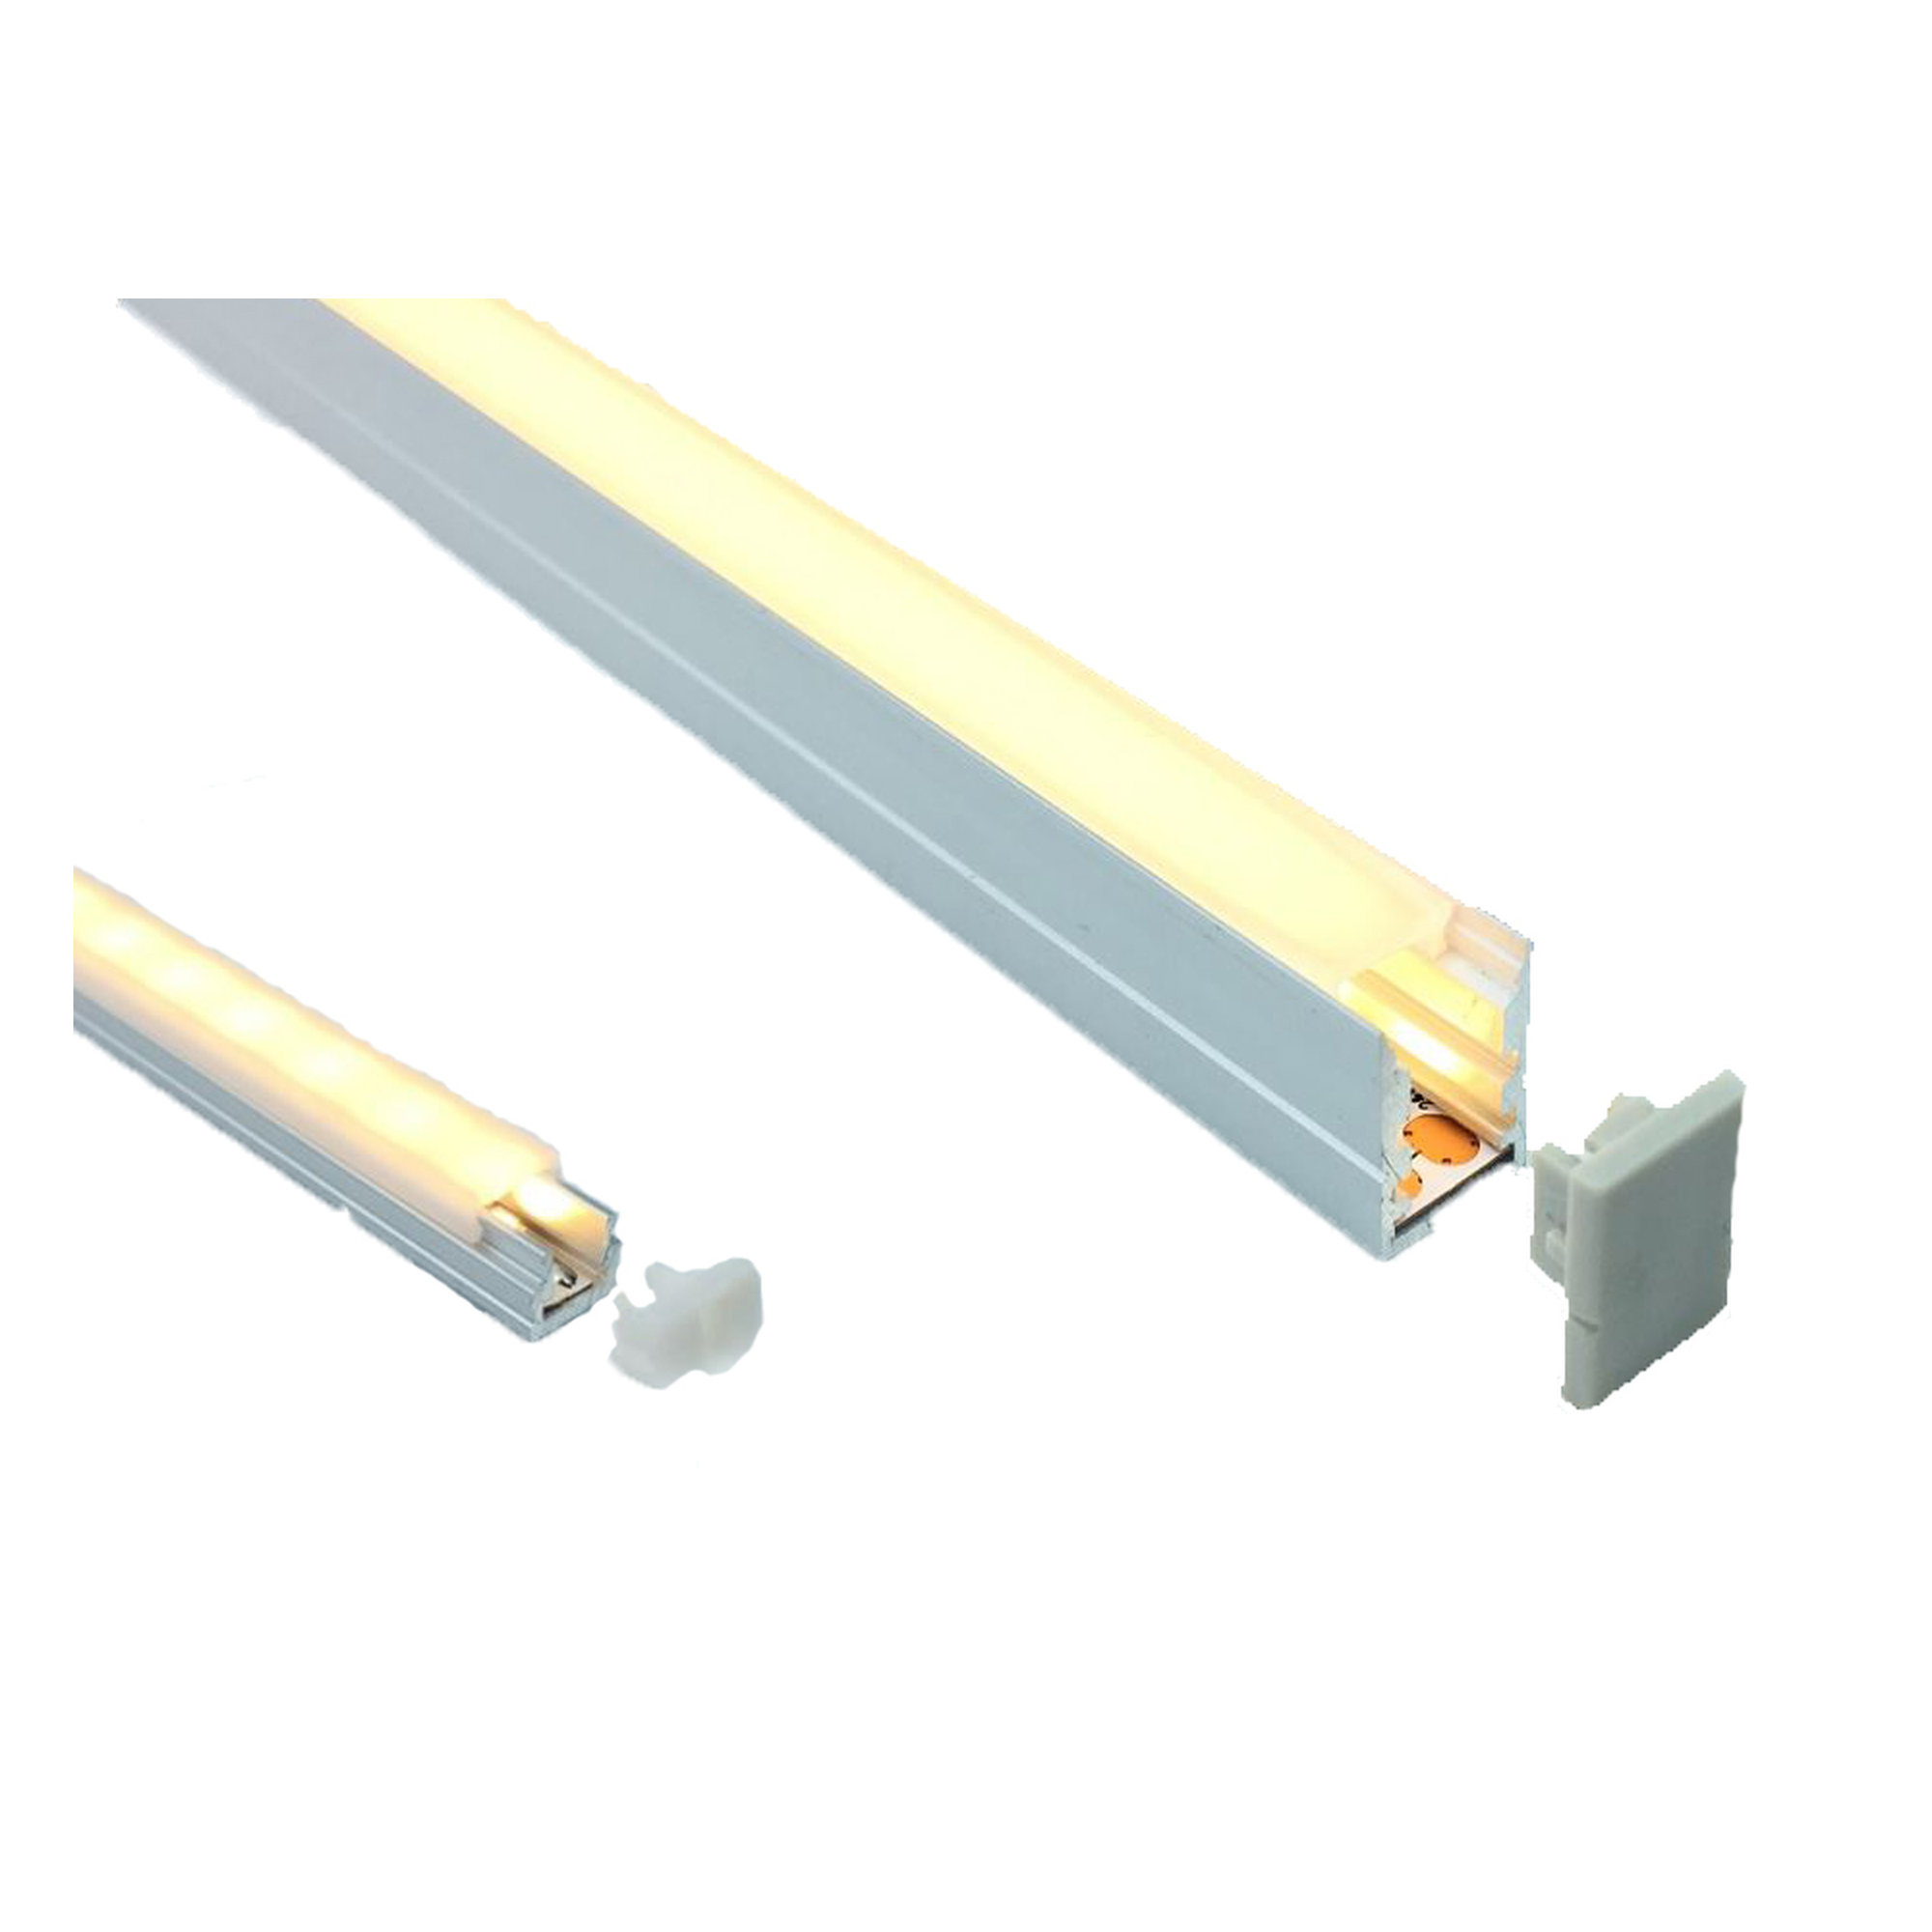 LED Profile 10 x 15mm Opal Diffuser